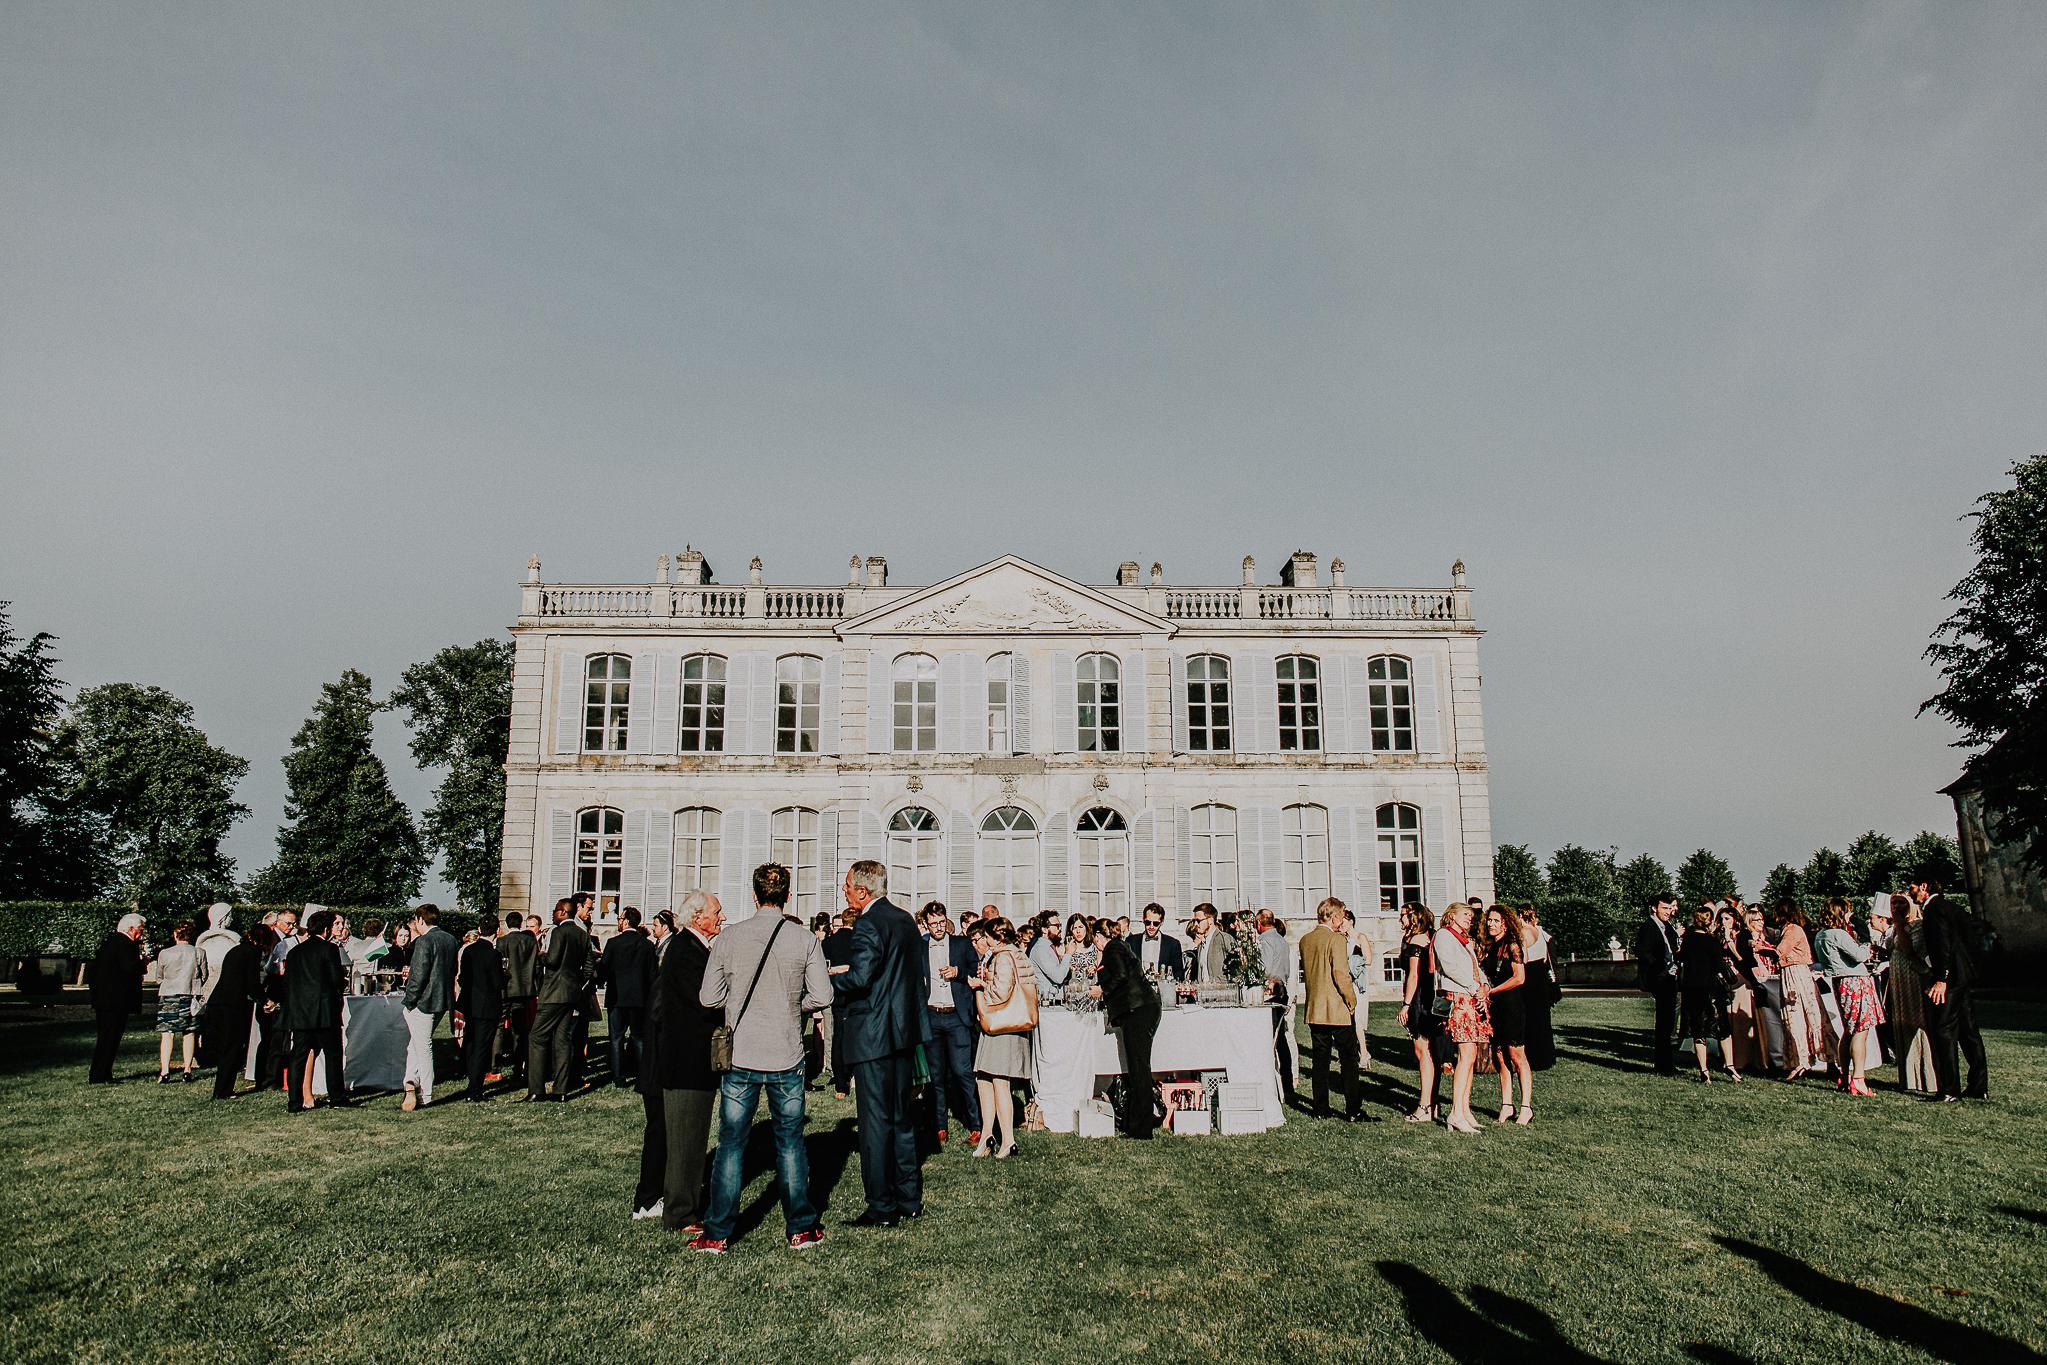 Dixie Martin Photography, Photography de Mariage Normandie, Mariage Château de Canon, Franco-Espaniol mariage, French wedding, summer